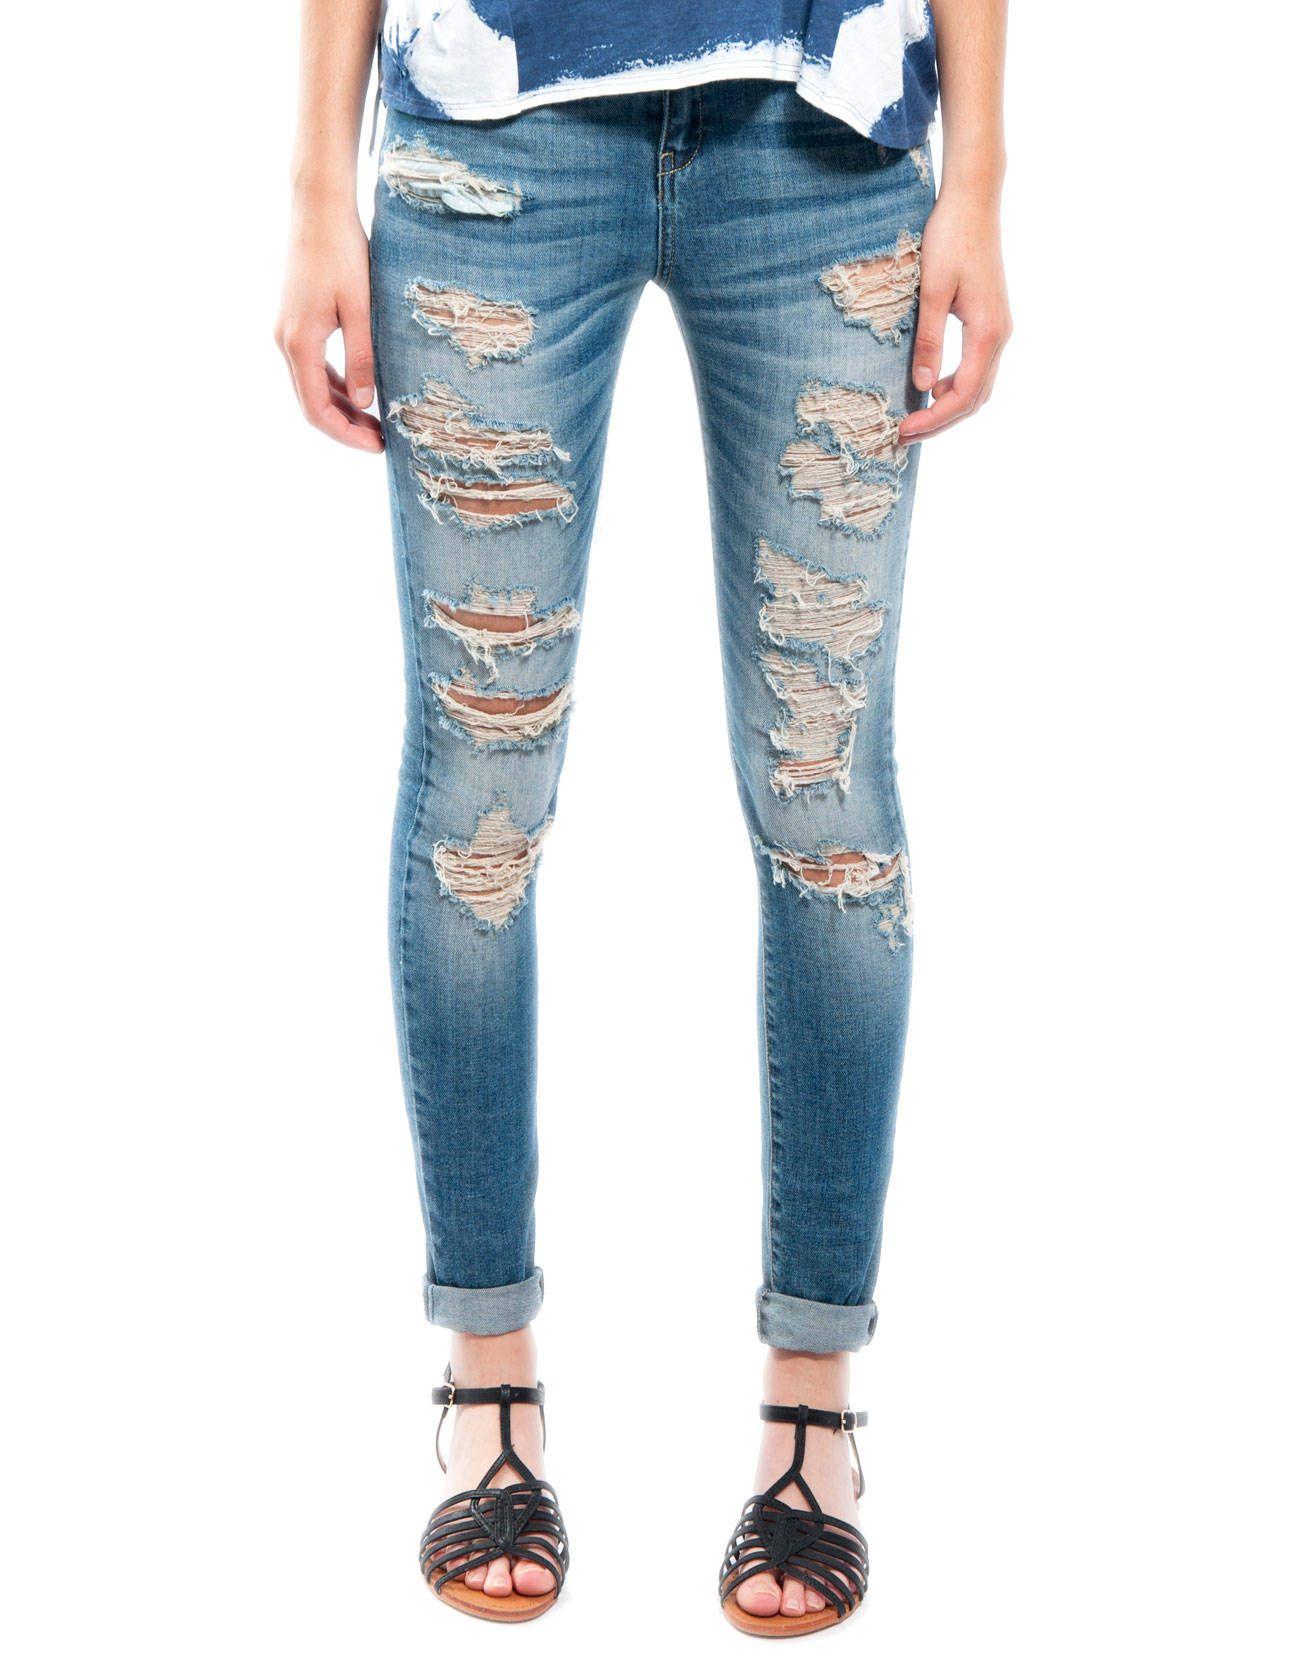 #Pantalón jeans straight rotos desgaste Shana 24,99€ www.shana.com #fashion #clothes #ropa